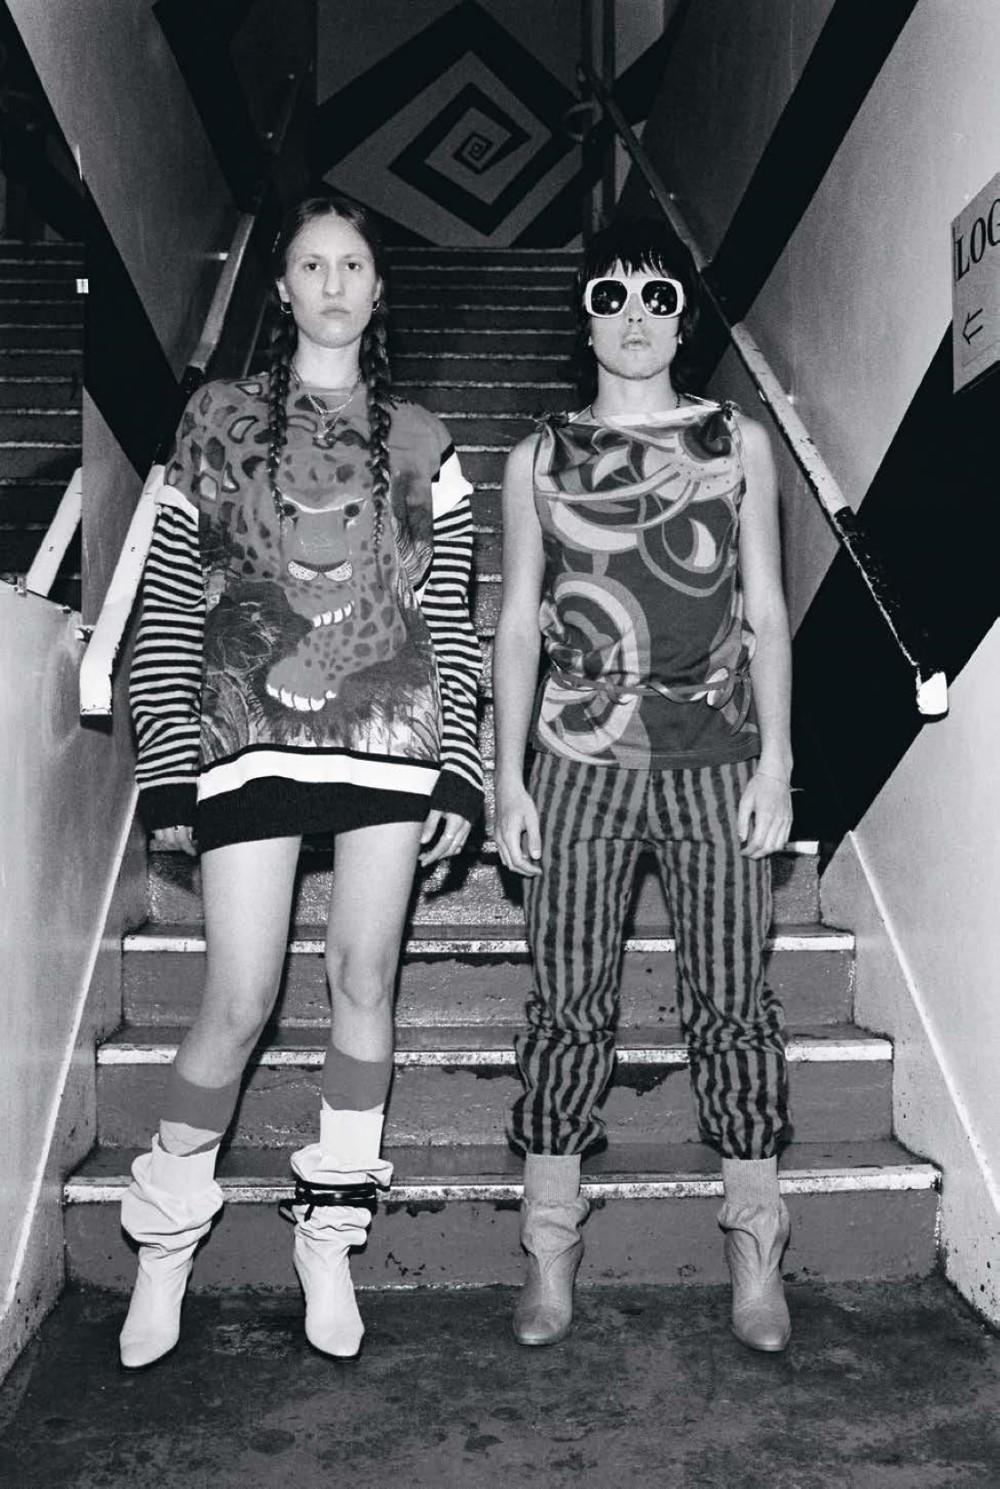 Kenzo's new capsule celebrates Kenzo Takada & Kansai Yamamoto, two Japanese fashion legends